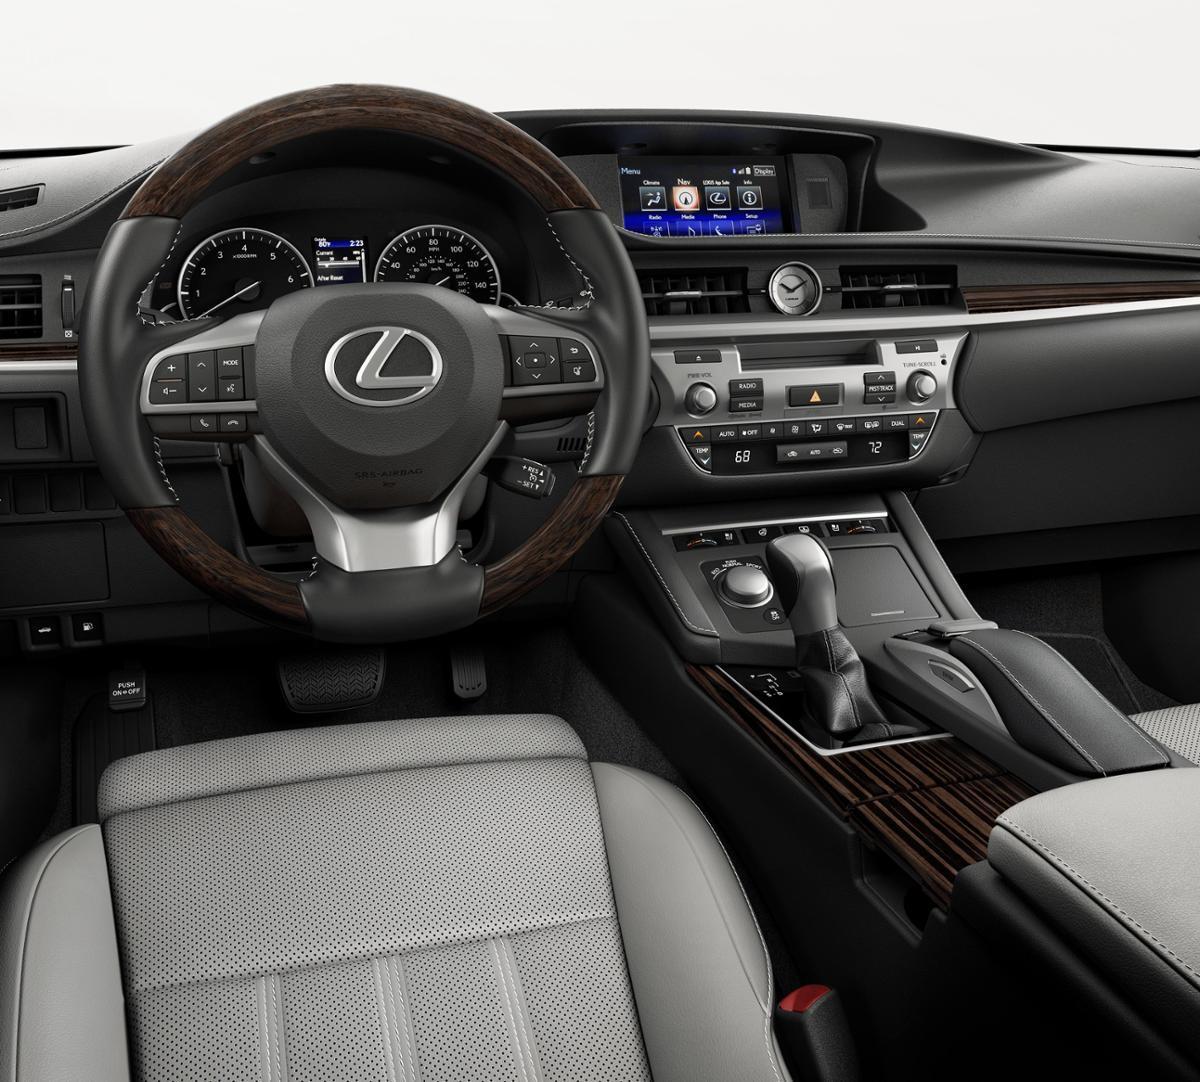 2017 Lexus ES 350 For Sale In San Juan 58ABK1GG8HU037138